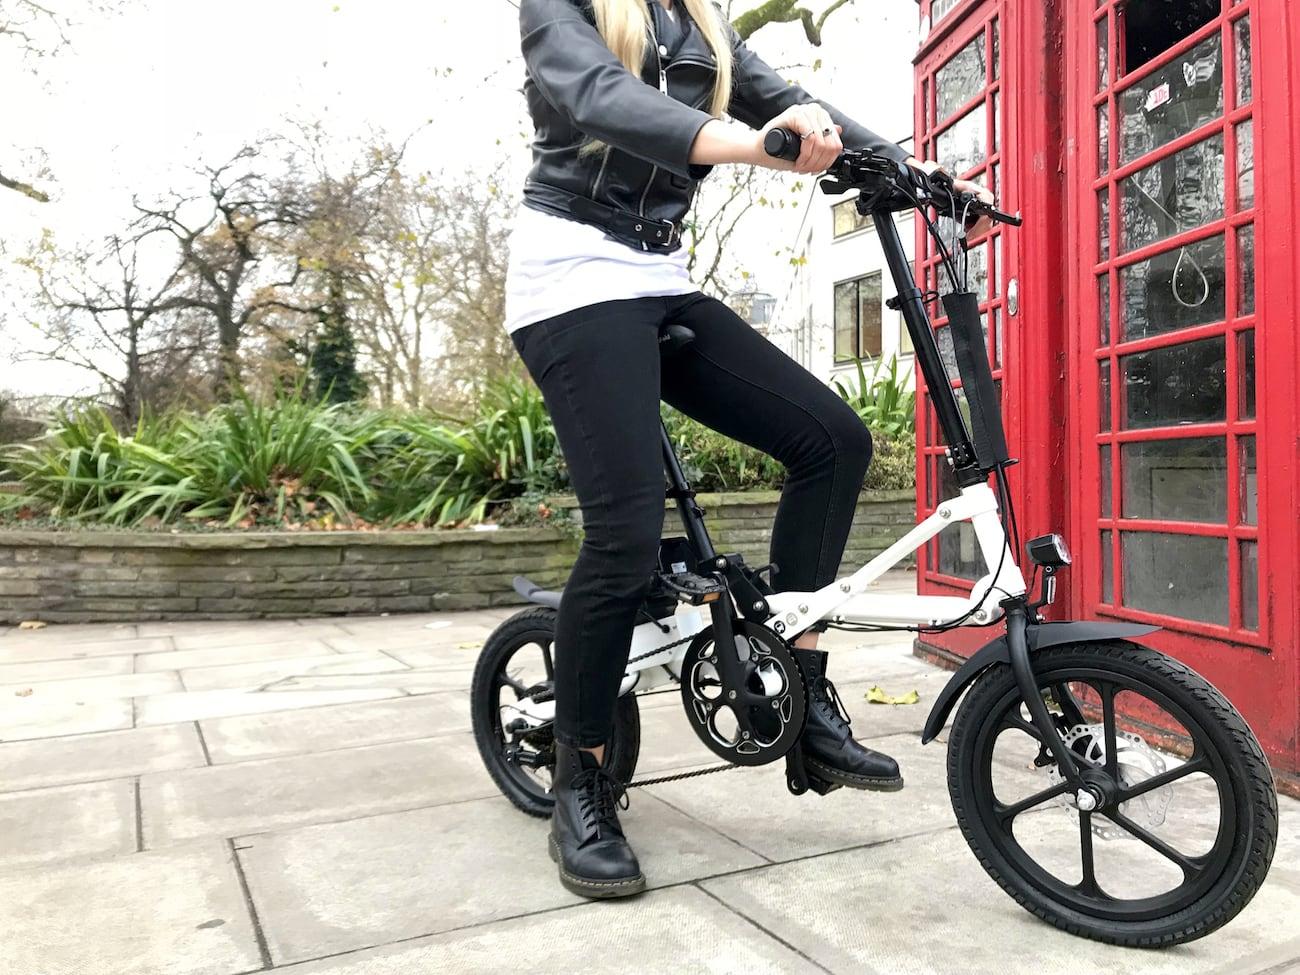 Kwikfold Ultra Quick Folding Bikes 187 Gadget Flow